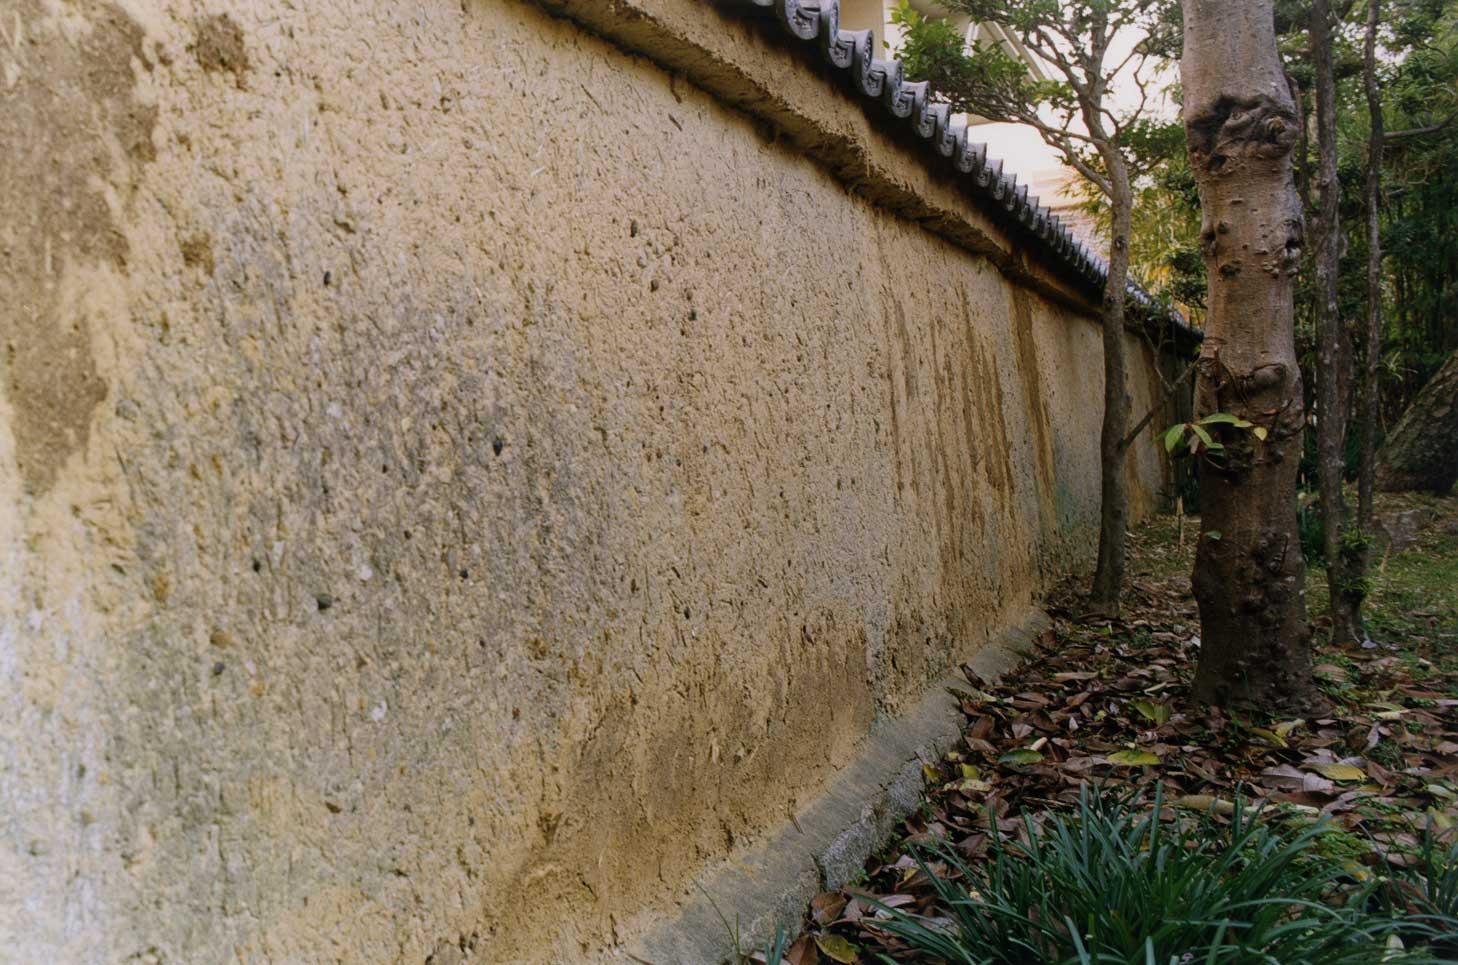 <p>畑田家住宅西築地塀</p>屋敷地の西側を仕切る土塀で、南築地塀の西端付近から北に29m延びる。石敷基礎上に築き、頂部に桟瓦葺屋根をのせる。中塗仕上げの土塀で、独特の風情をつくる。屋敷地の構成要素であると共に、往時の地割を伝える。